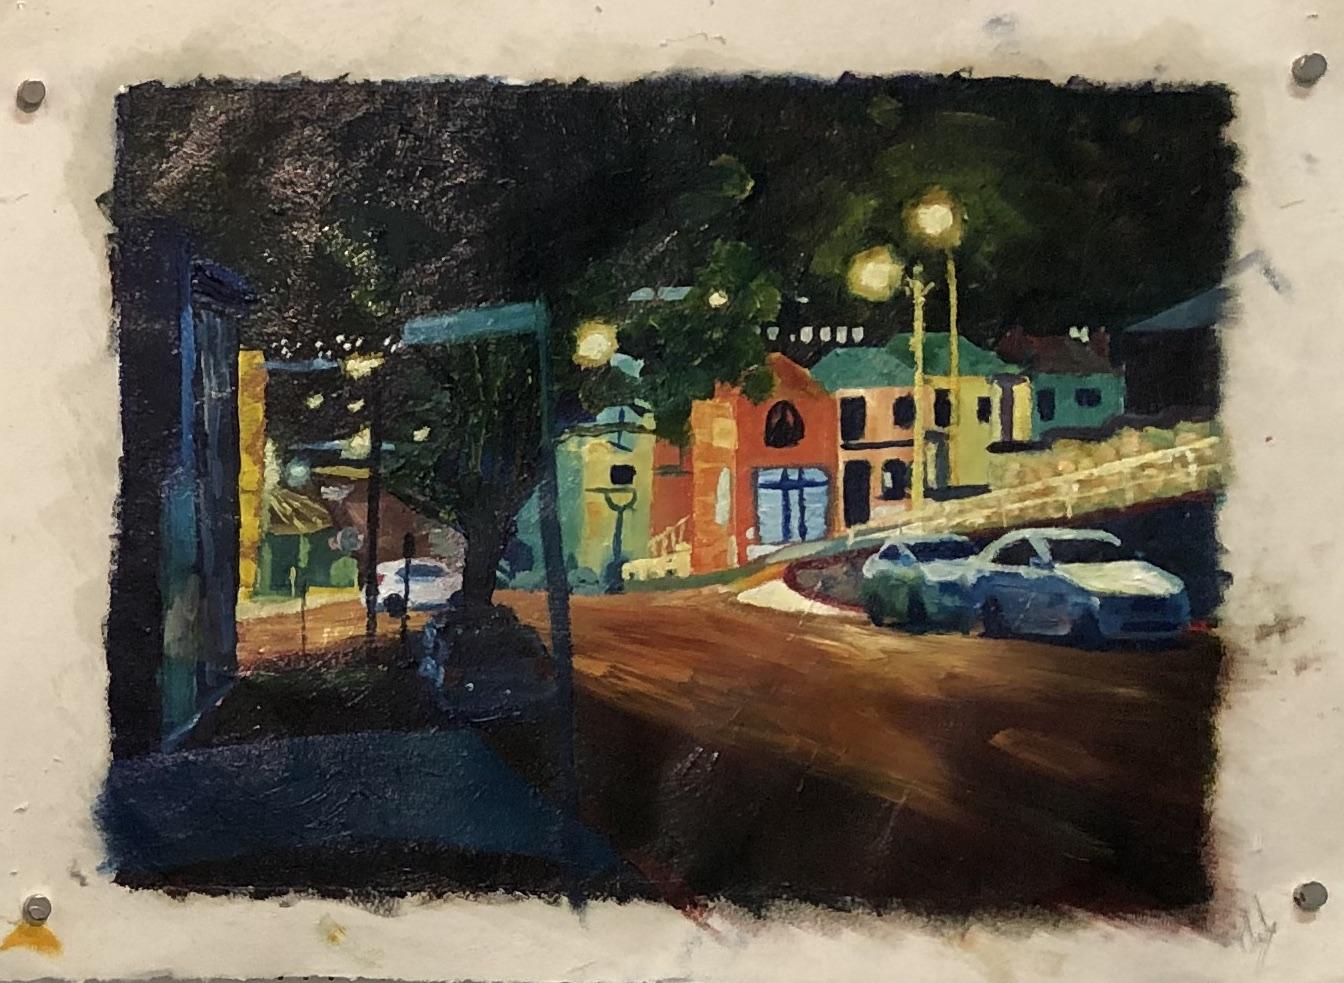 22. Patrick Mavety  Wolfe St commute  2019 oil on cotton paper 30 x 40cm unframed $390.00